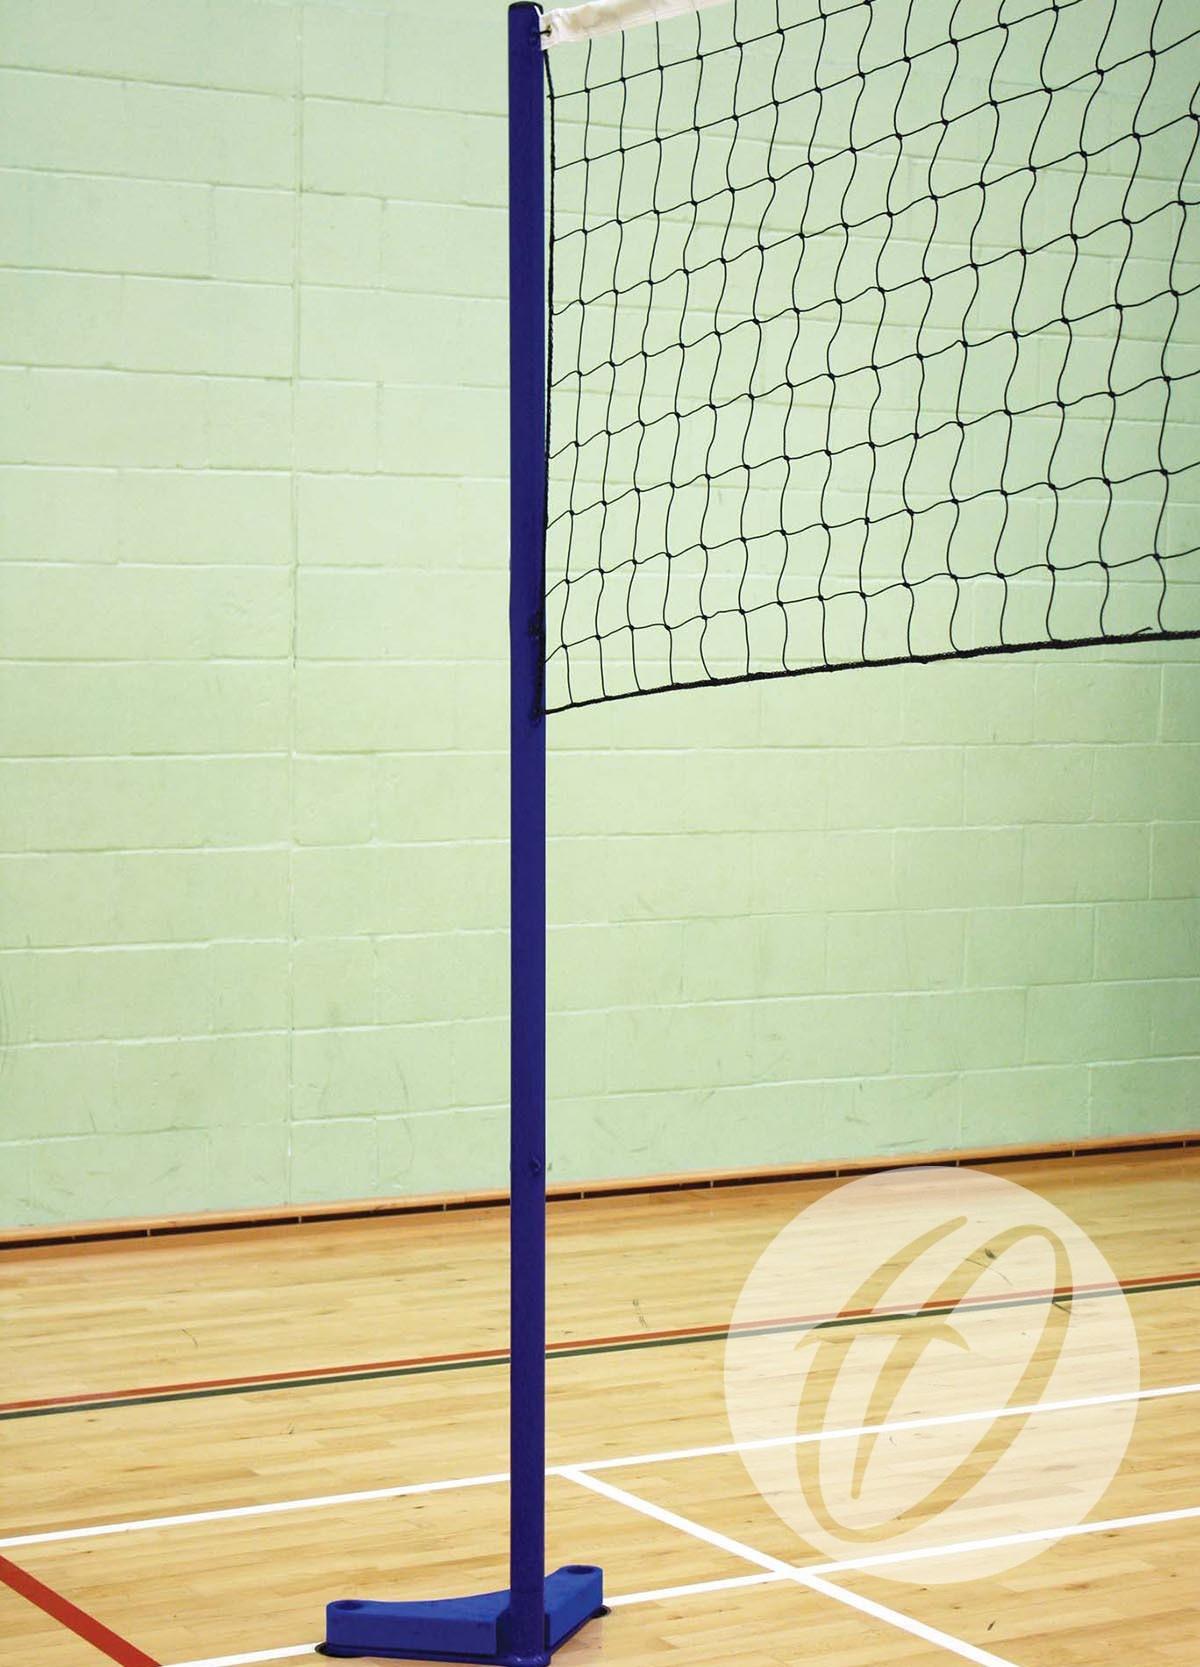 Floor Fixed Volleyball Set 50mm Club Posts Harrod Sport